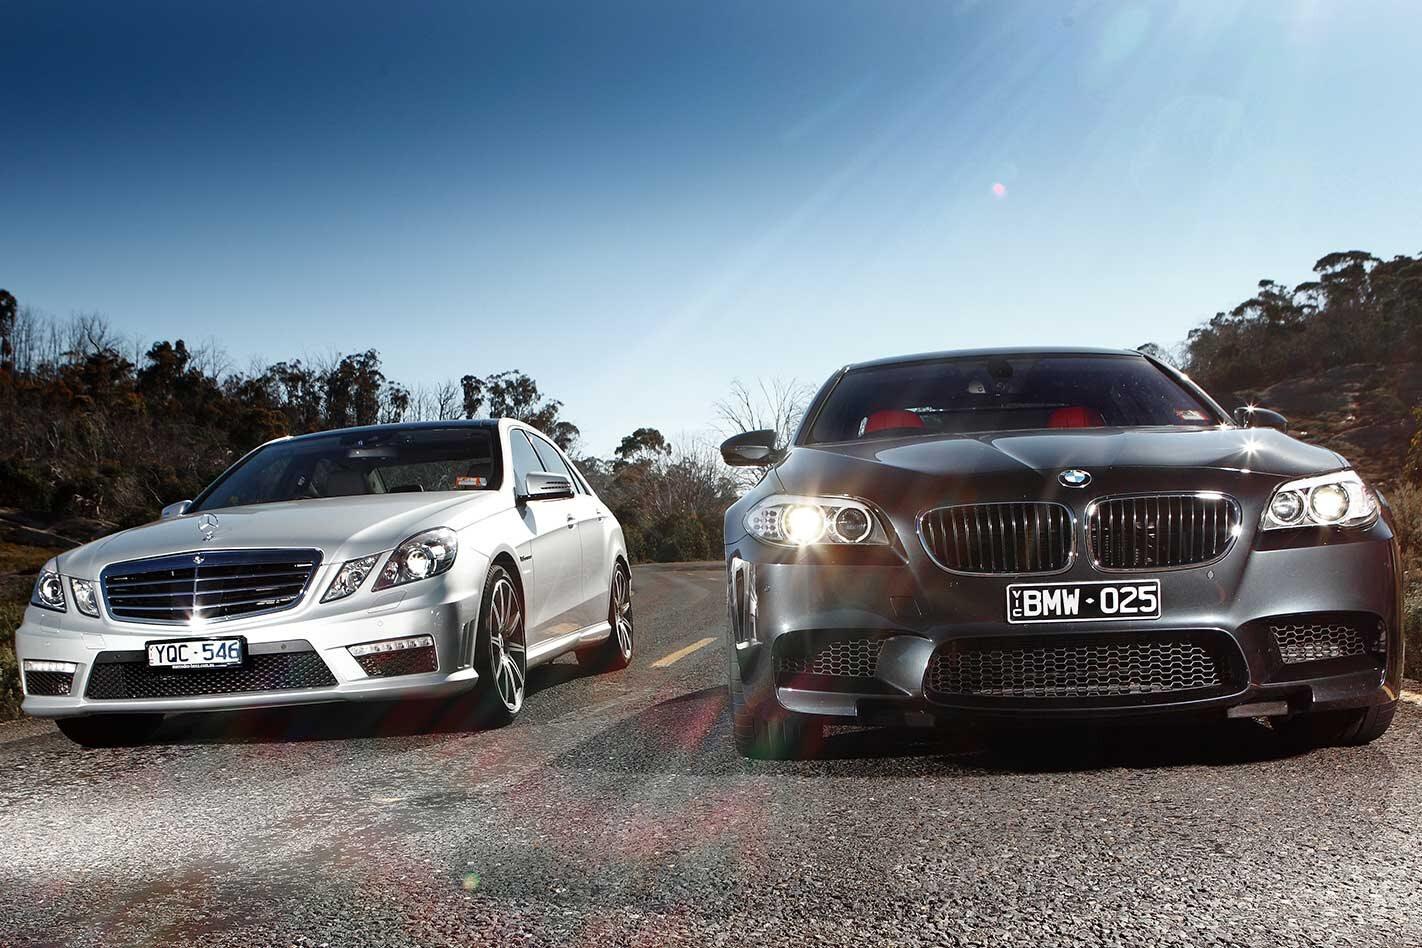 2010 BMW M5 vs Mercedes-Benz E63 AMG comparison